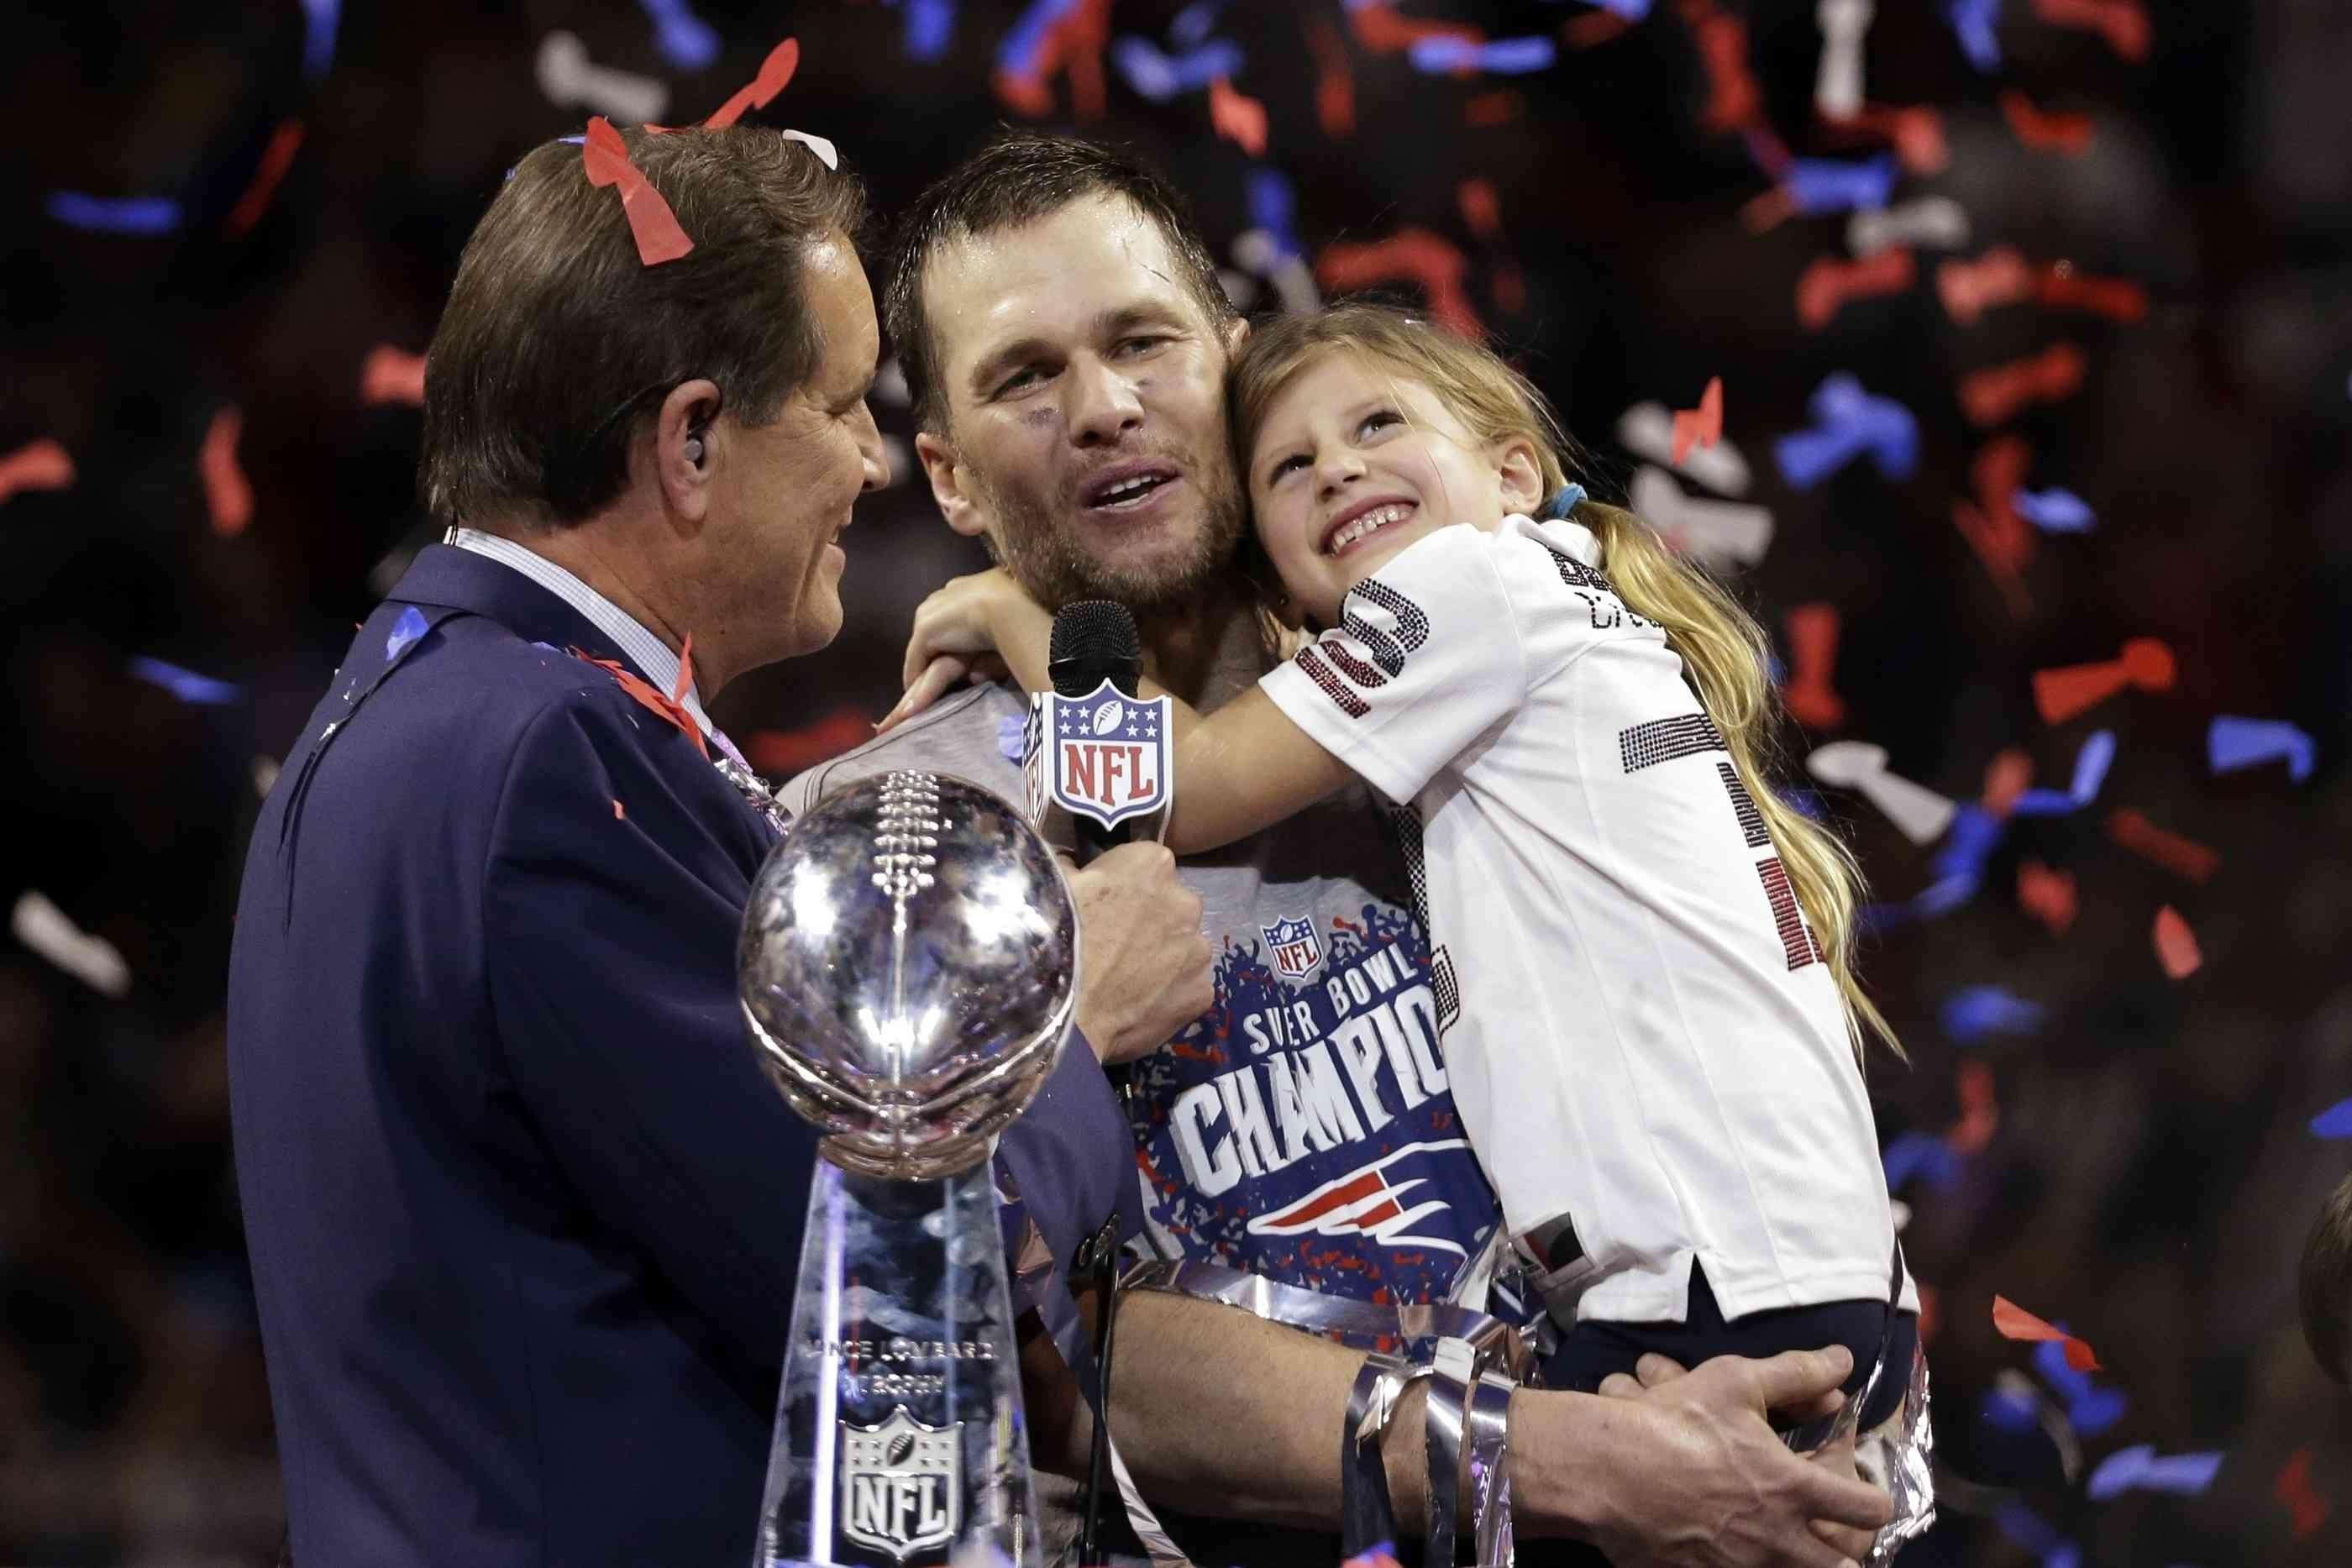 Super Bowl 2019: Tom Brady Feiert 6. Titel Mit Seiner inside Super Bowl 2019 Tom Brady